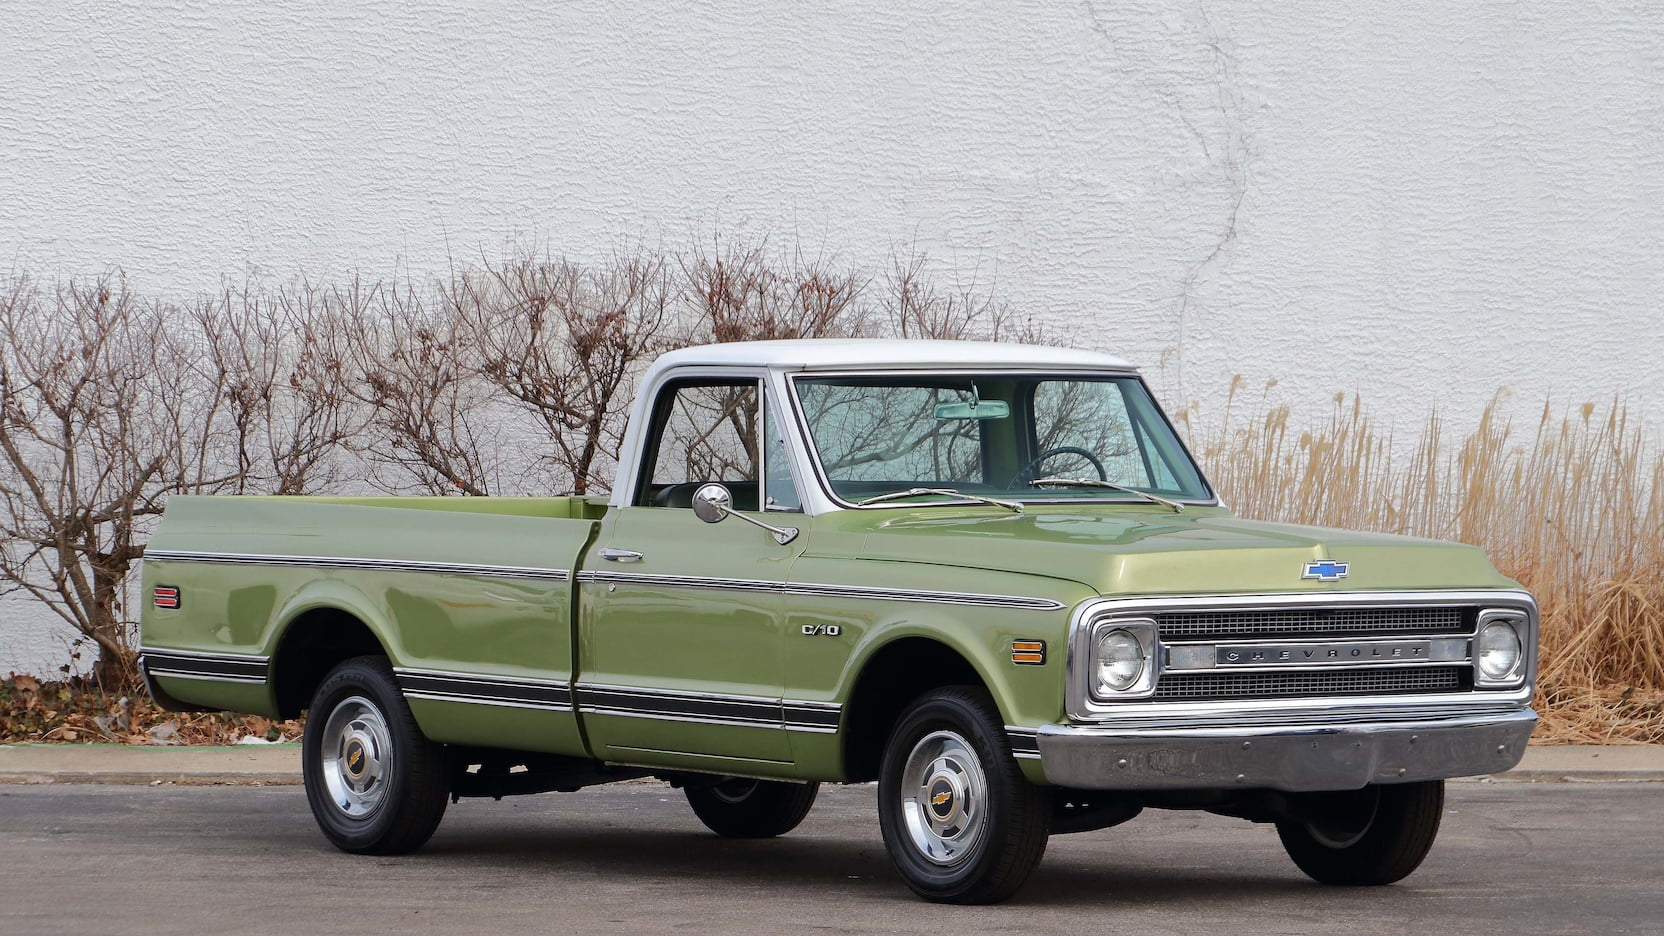 1970 Chevrolet C10 front 3/4